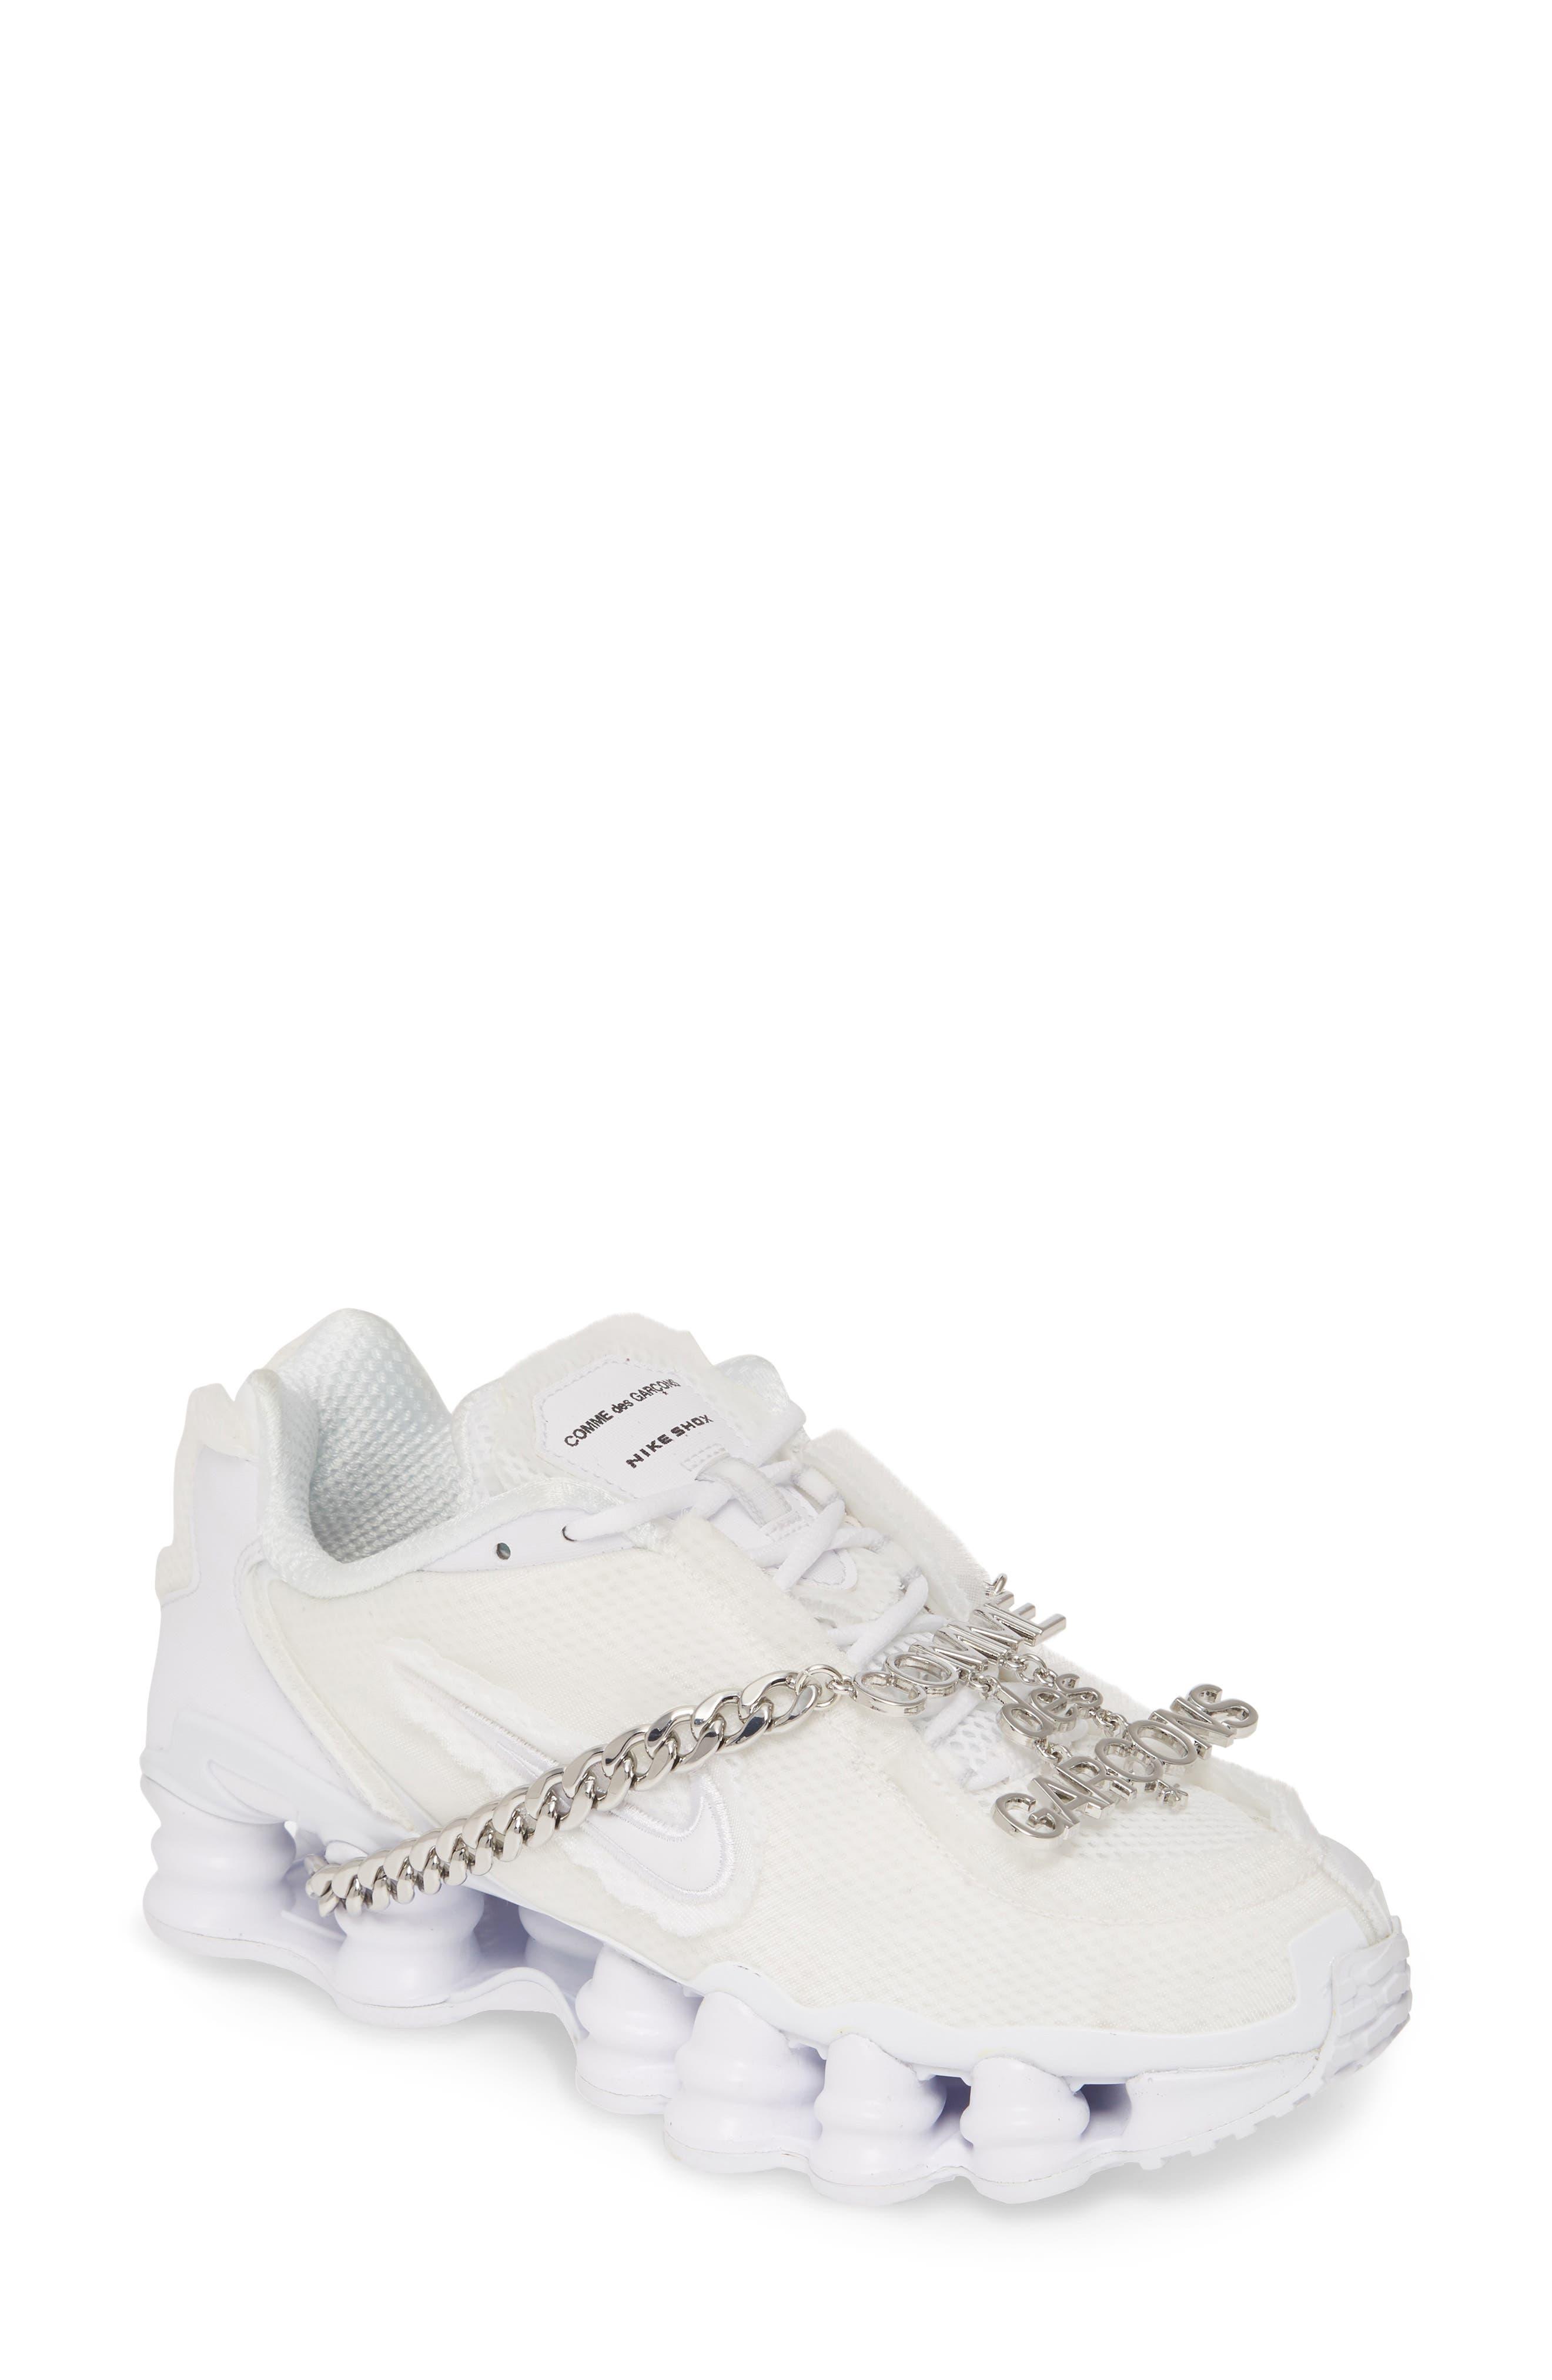 048047a25c5336 Women's Designer Shoes | Nordstrom